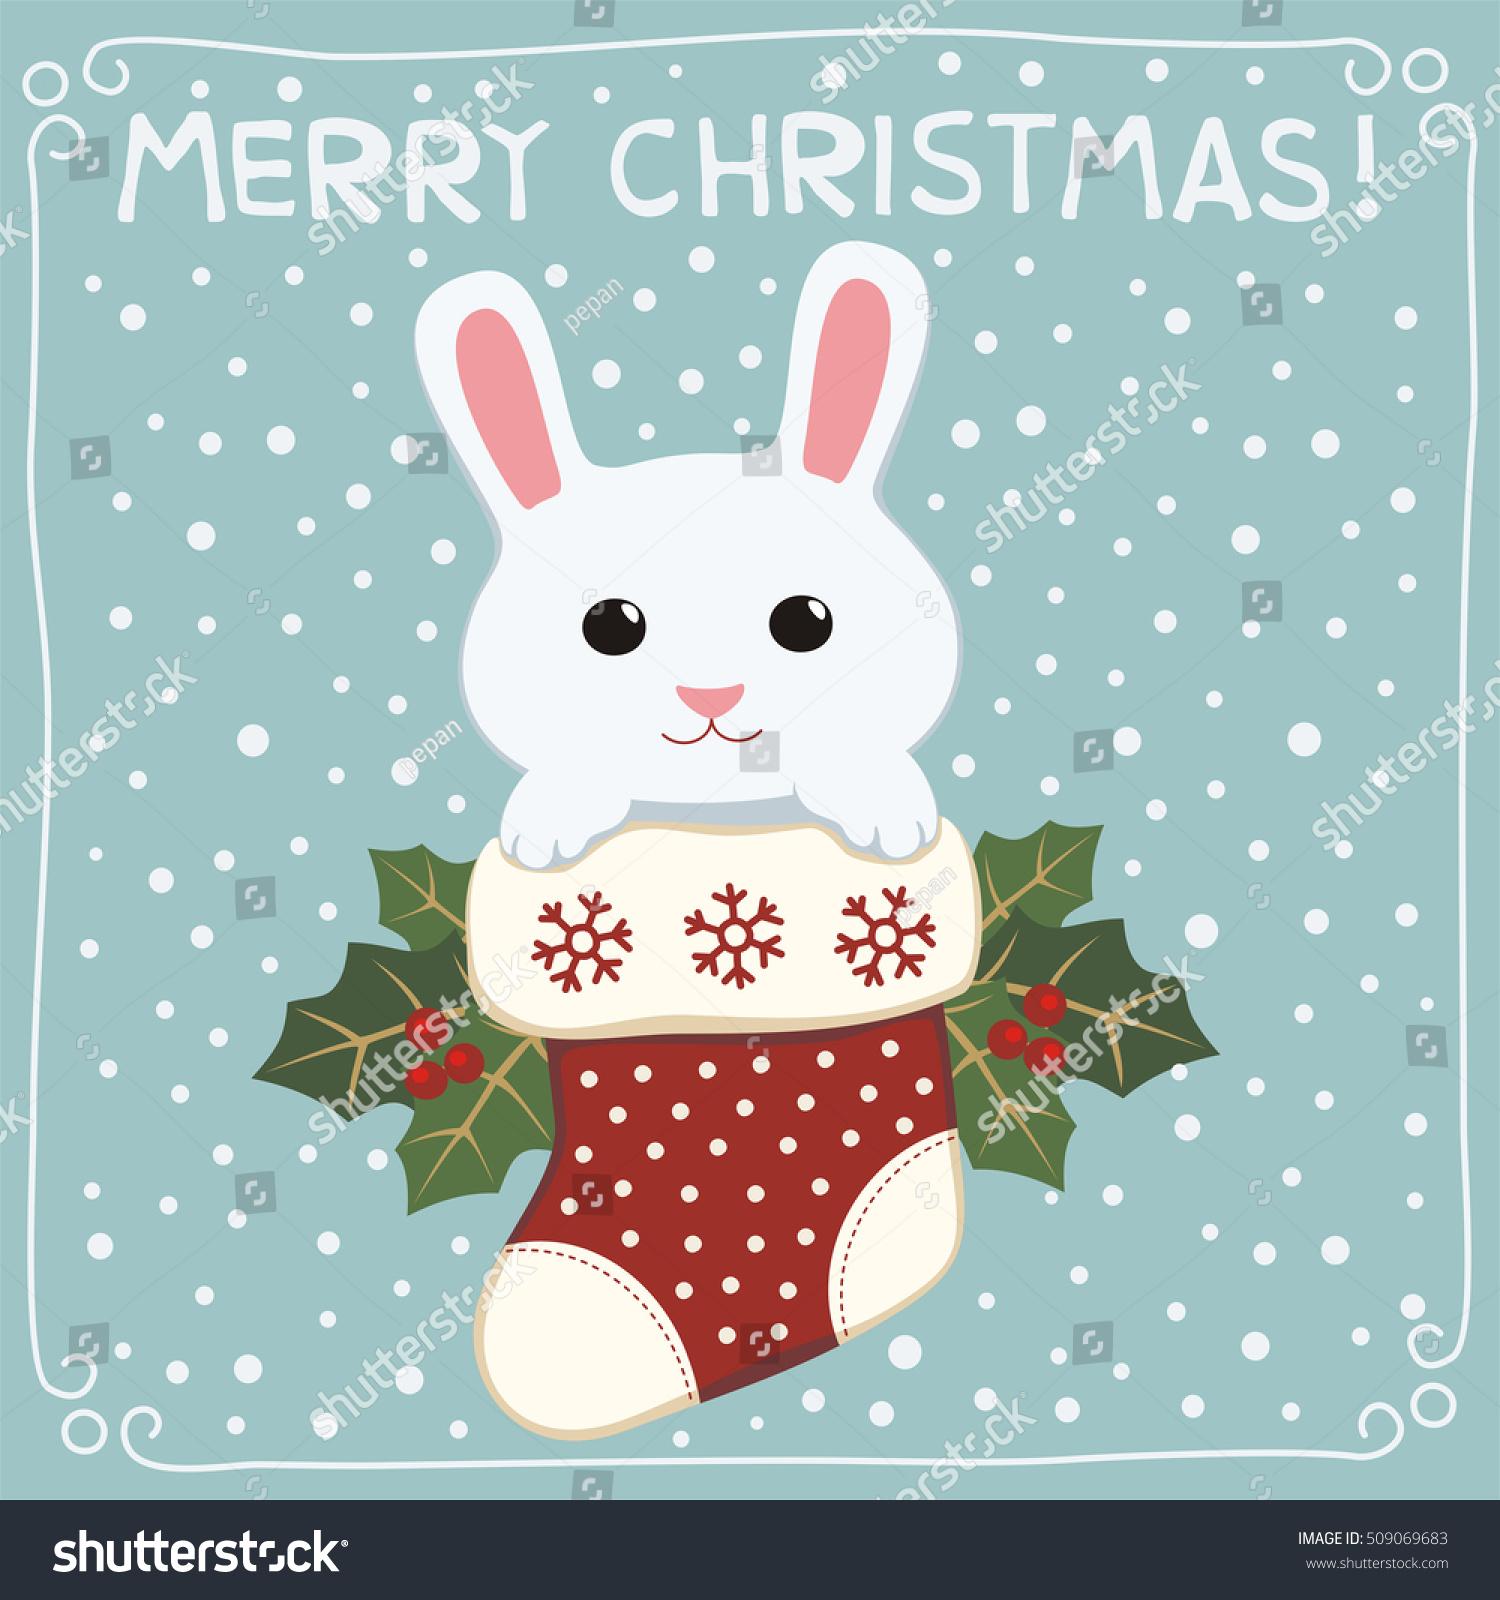 Merry Christmas Cute Bunny Rabbit Stocking Stock Vector (Royalty ...